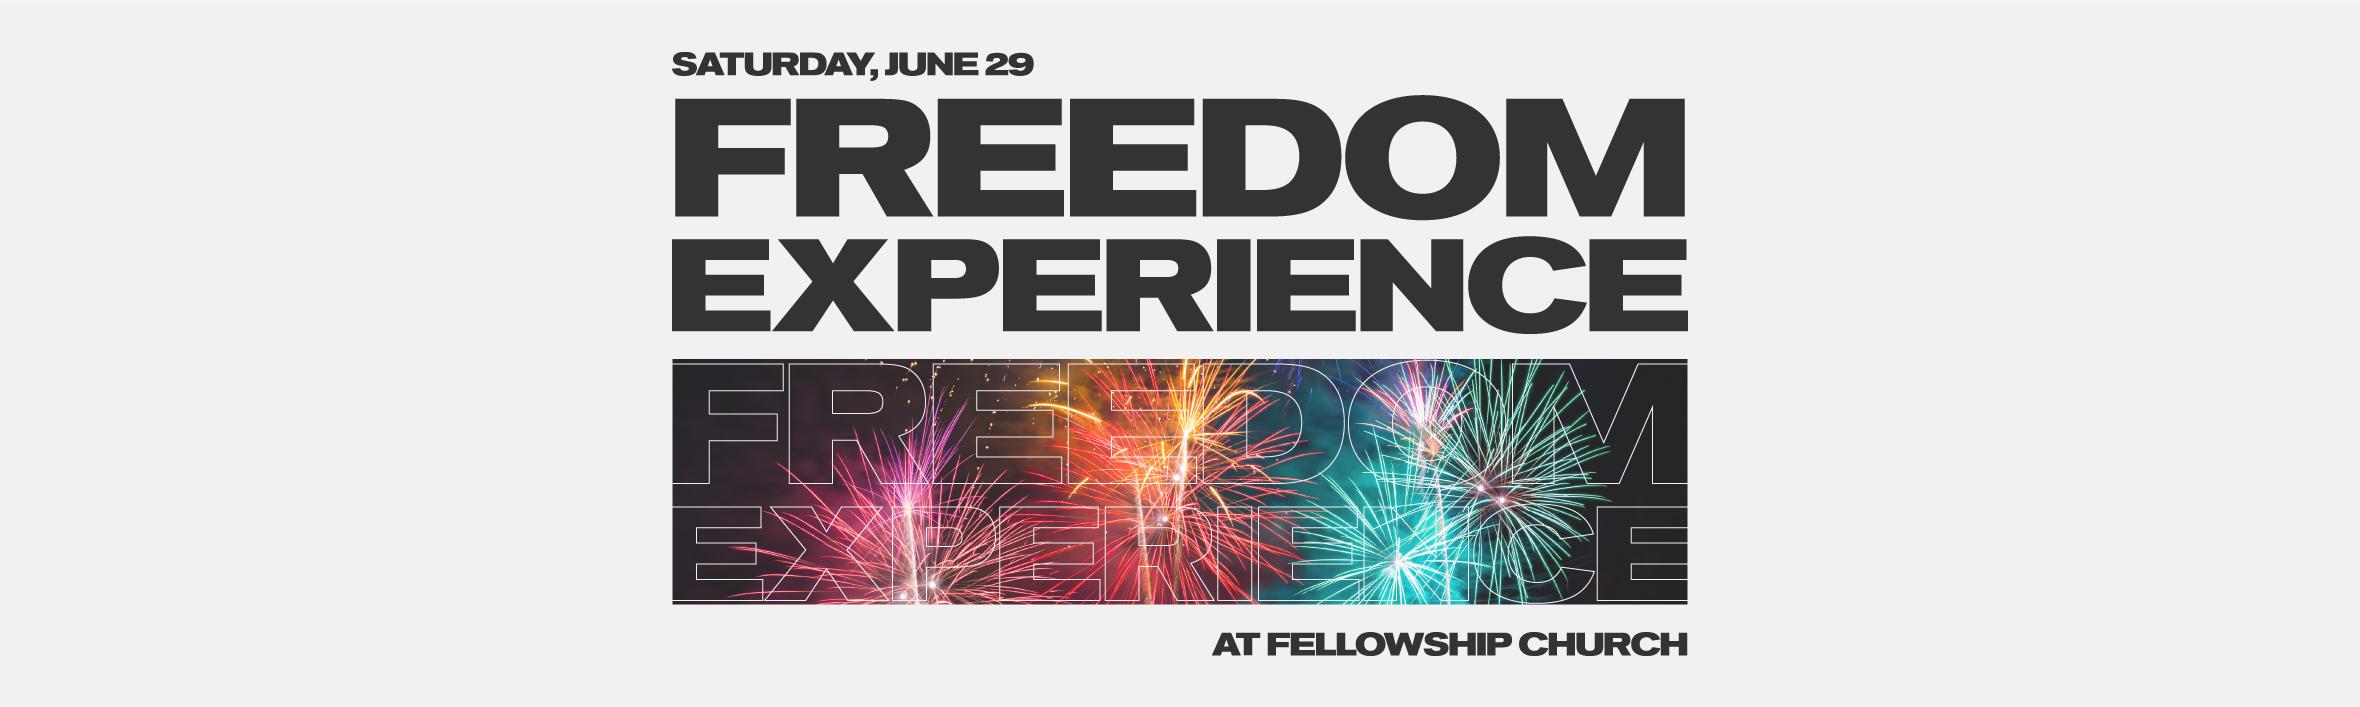 Freedom Experience